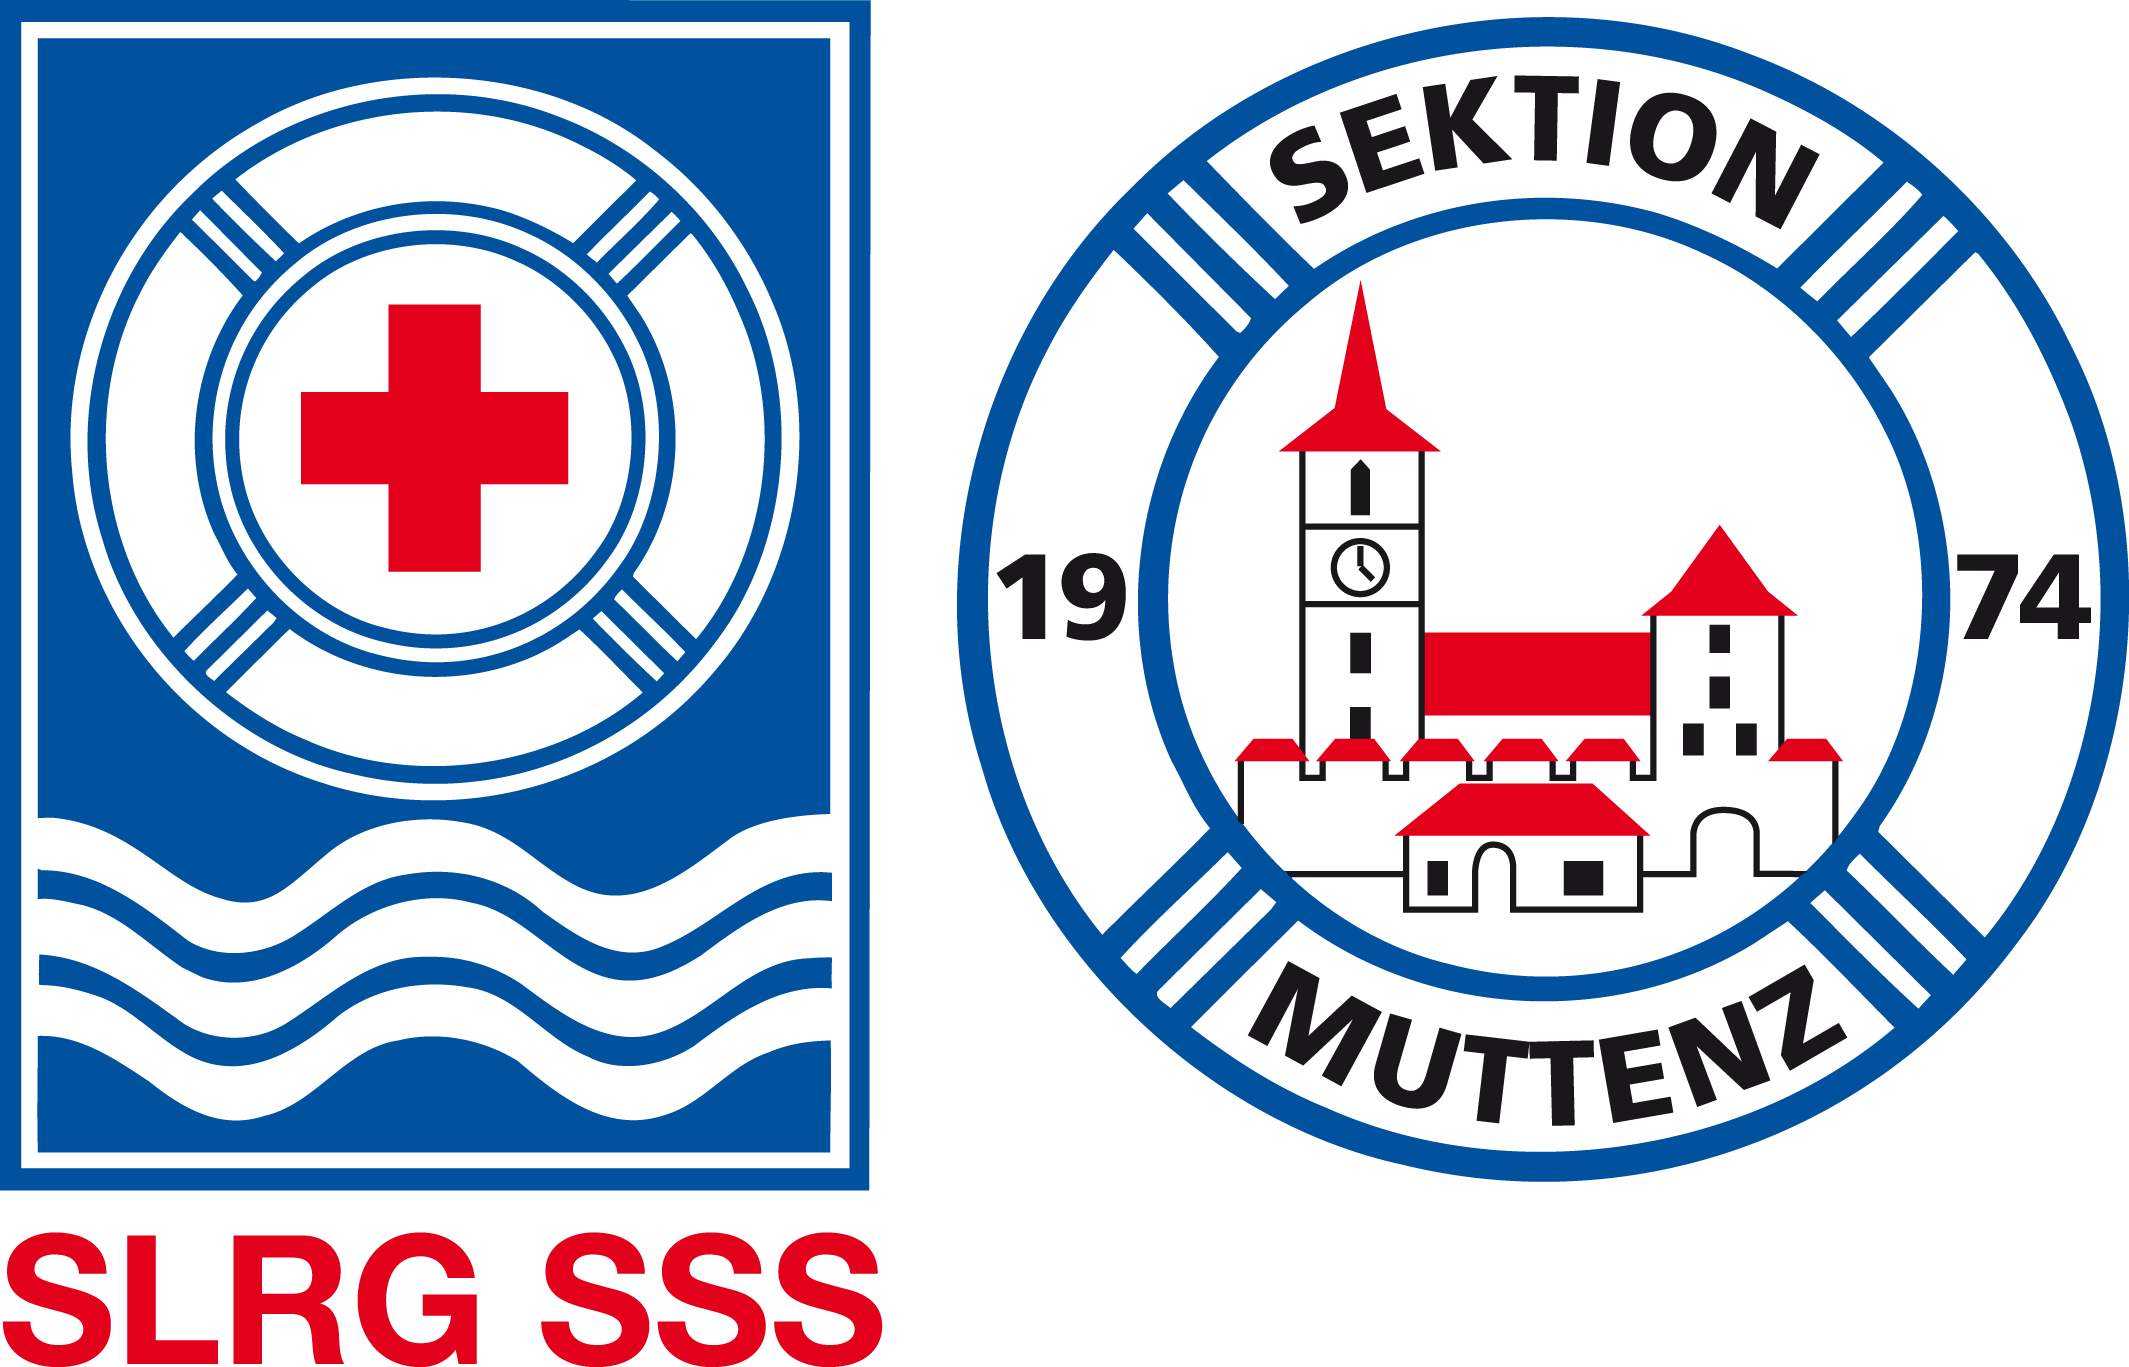 SLRG Muttenz